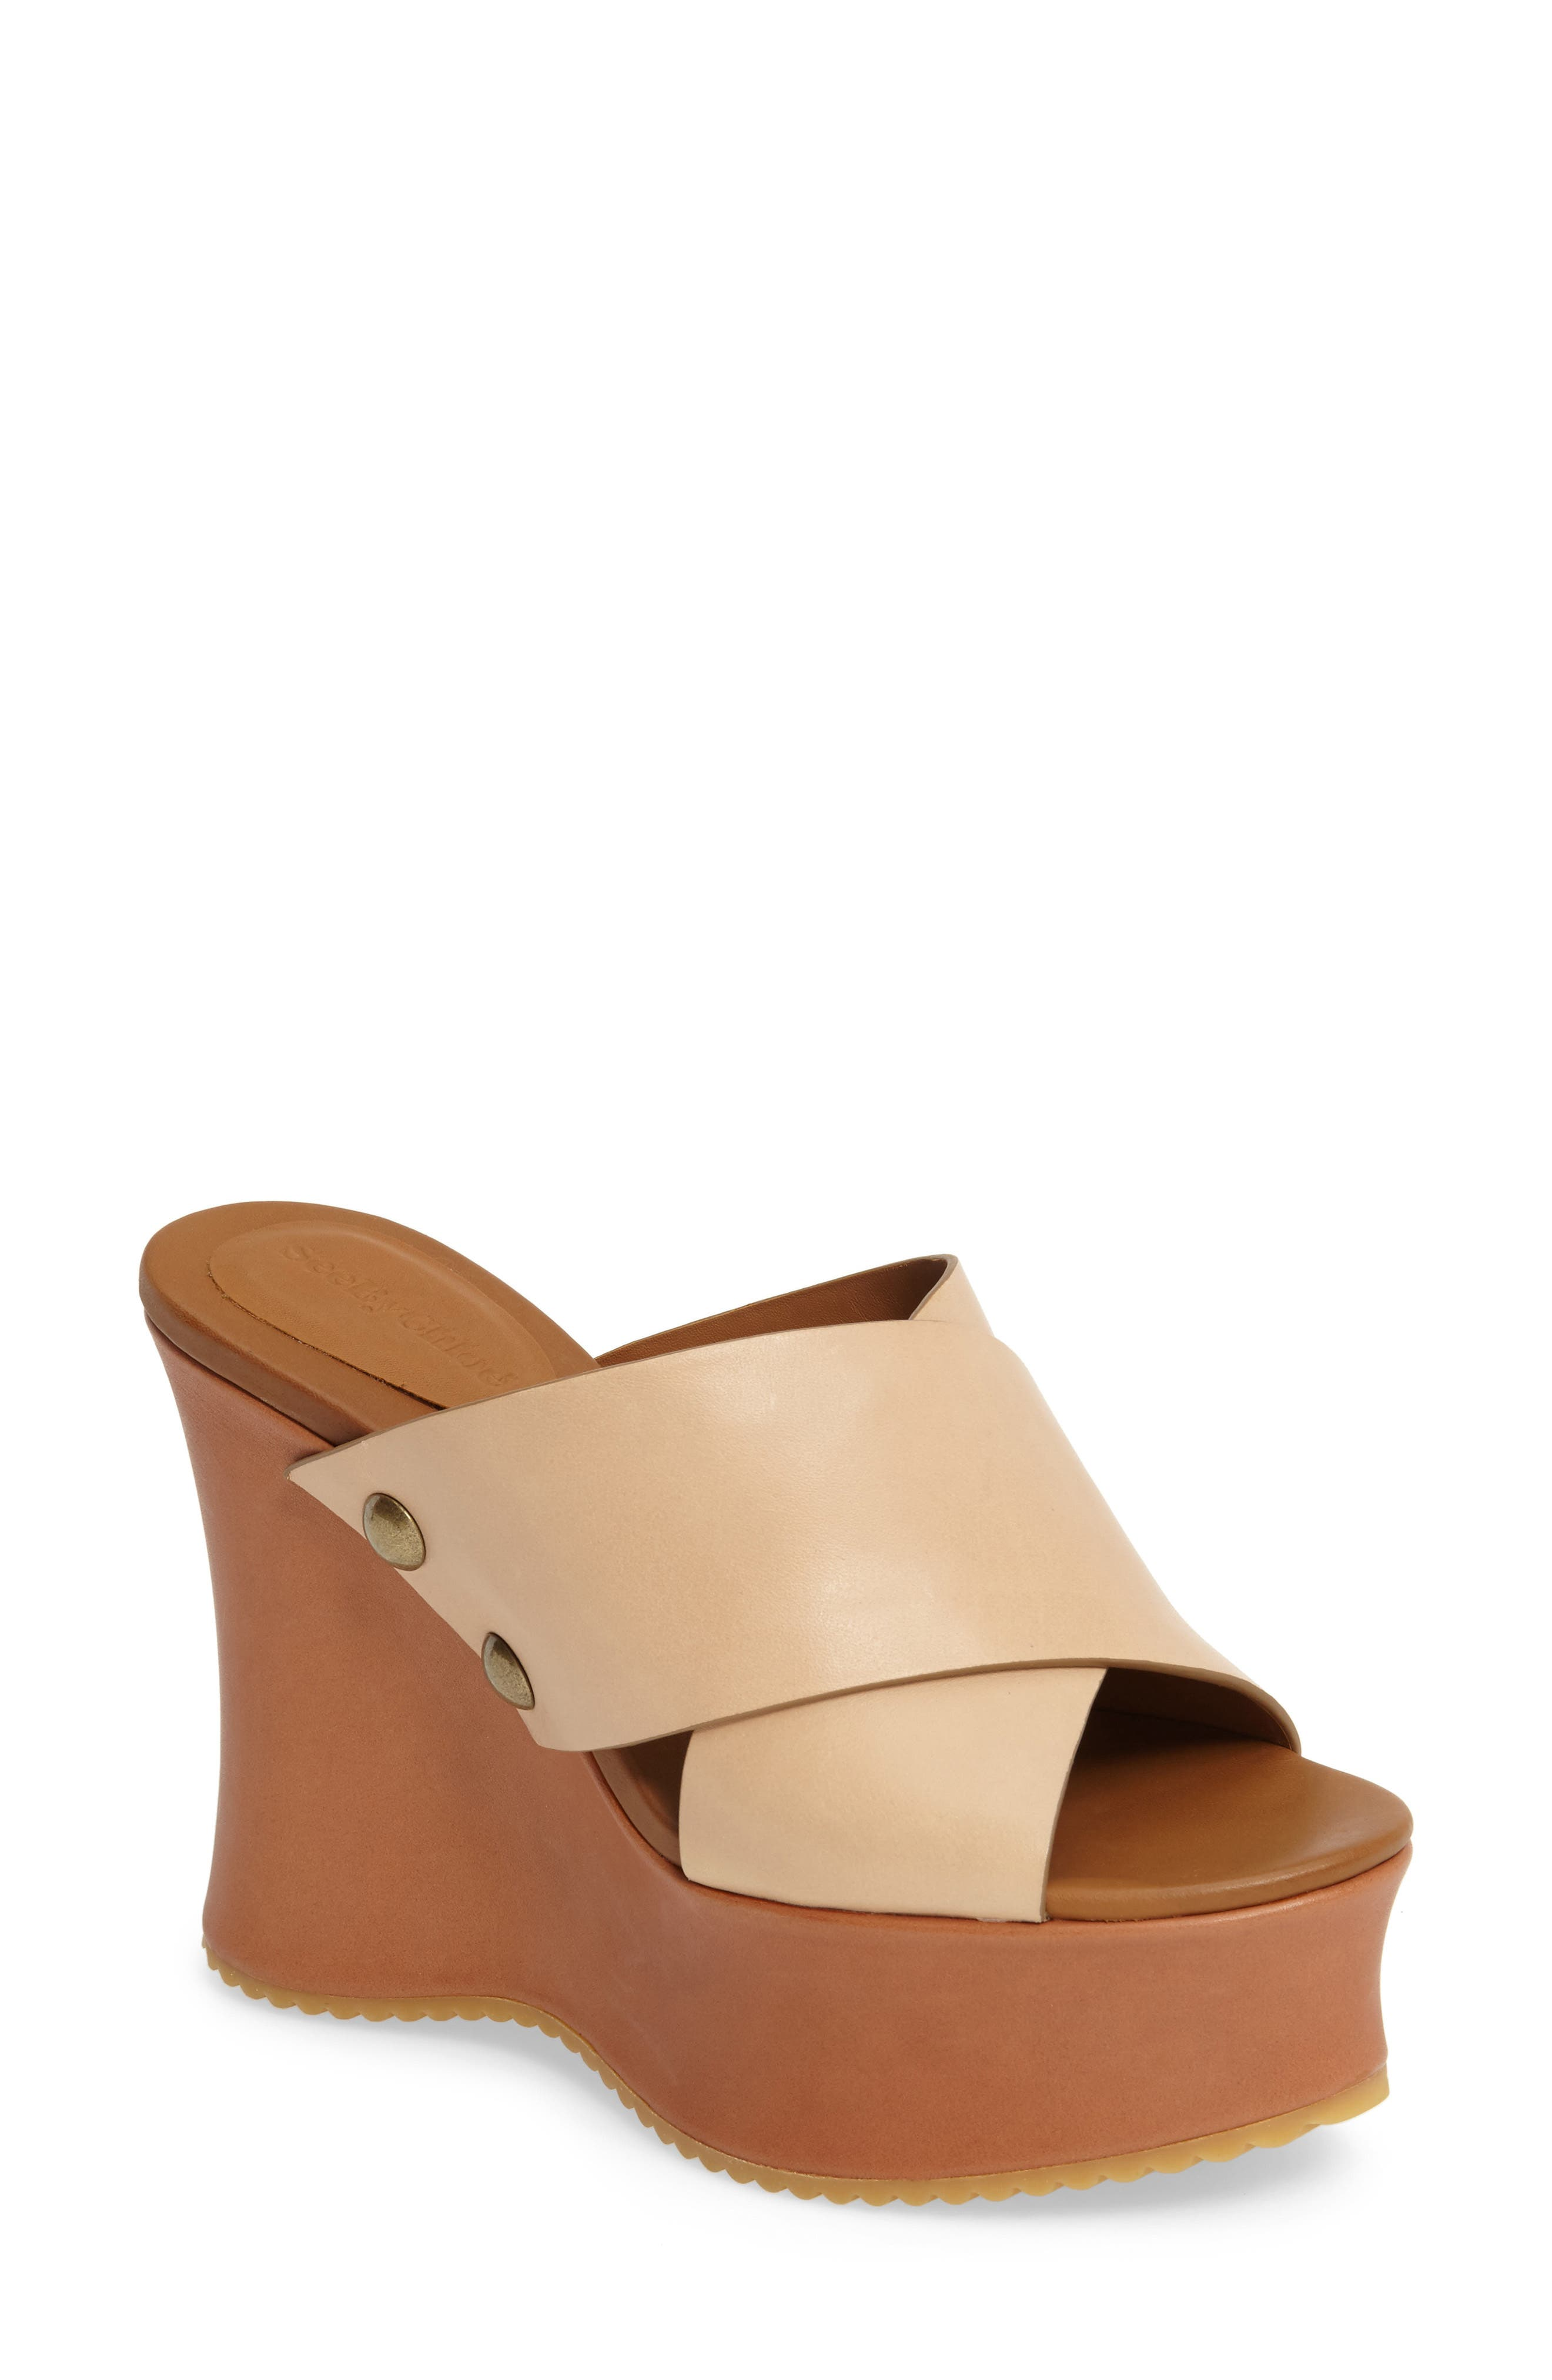 Alternate Image 1 Selected - See by Chloé Maya Platform Sandal (Women)